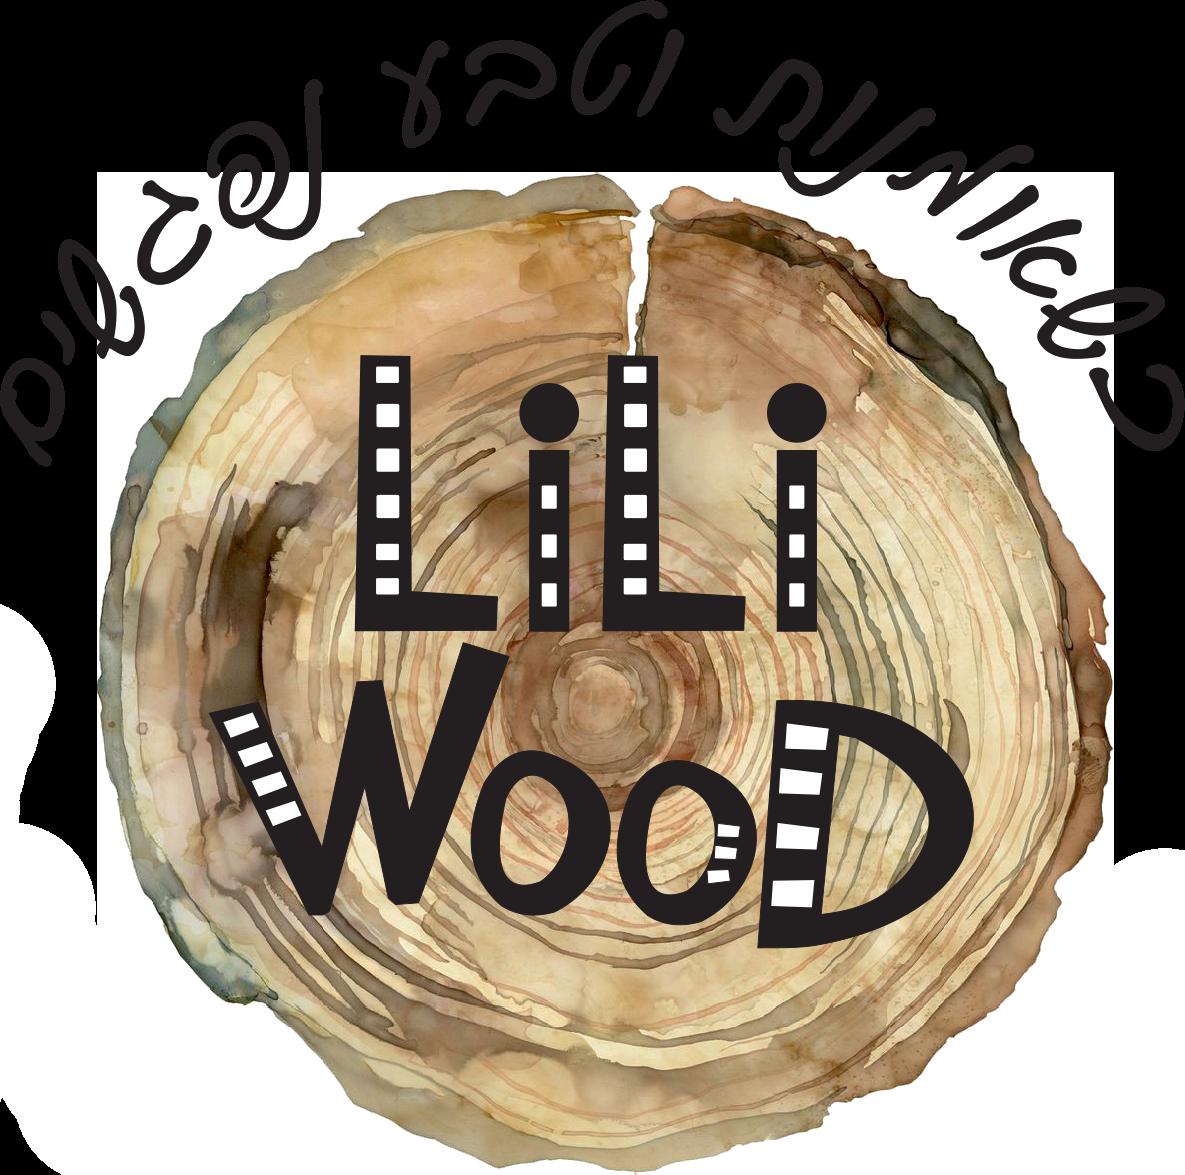 Lili Wood-final copy